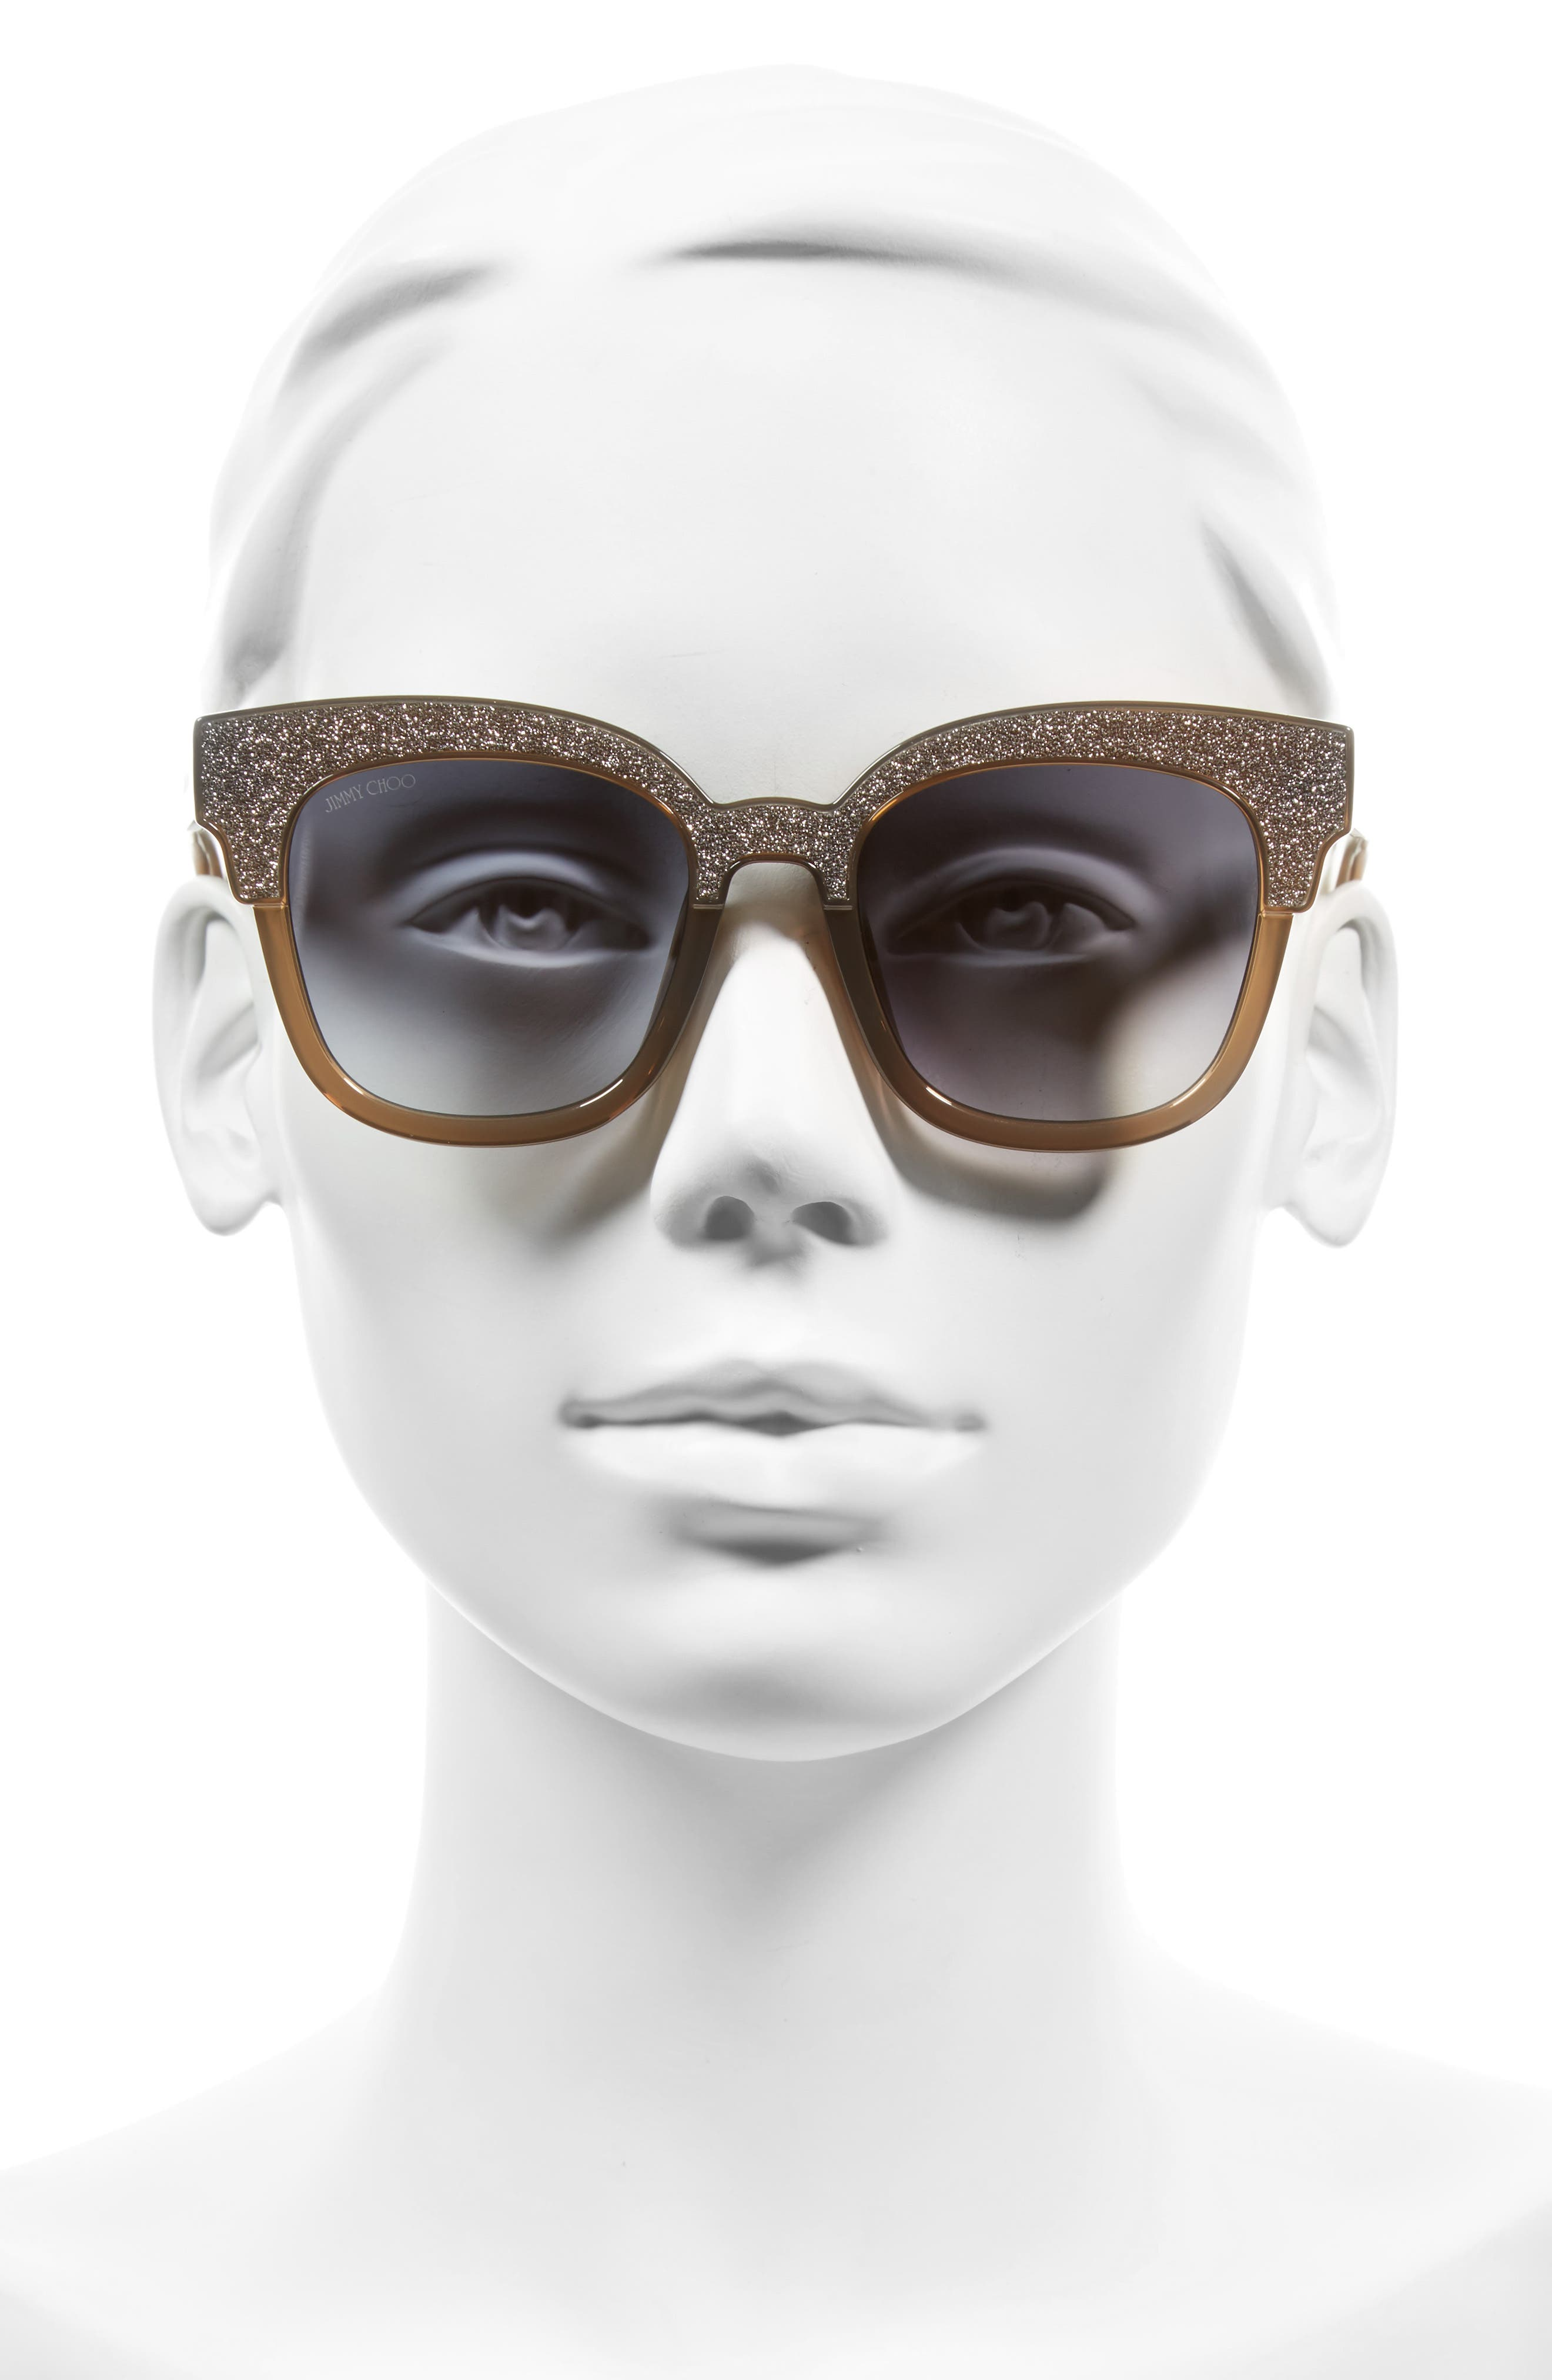 Mayelas 50mm Cat Eye Sunglasses,                             Alternate thumbnail 2, color,                             200